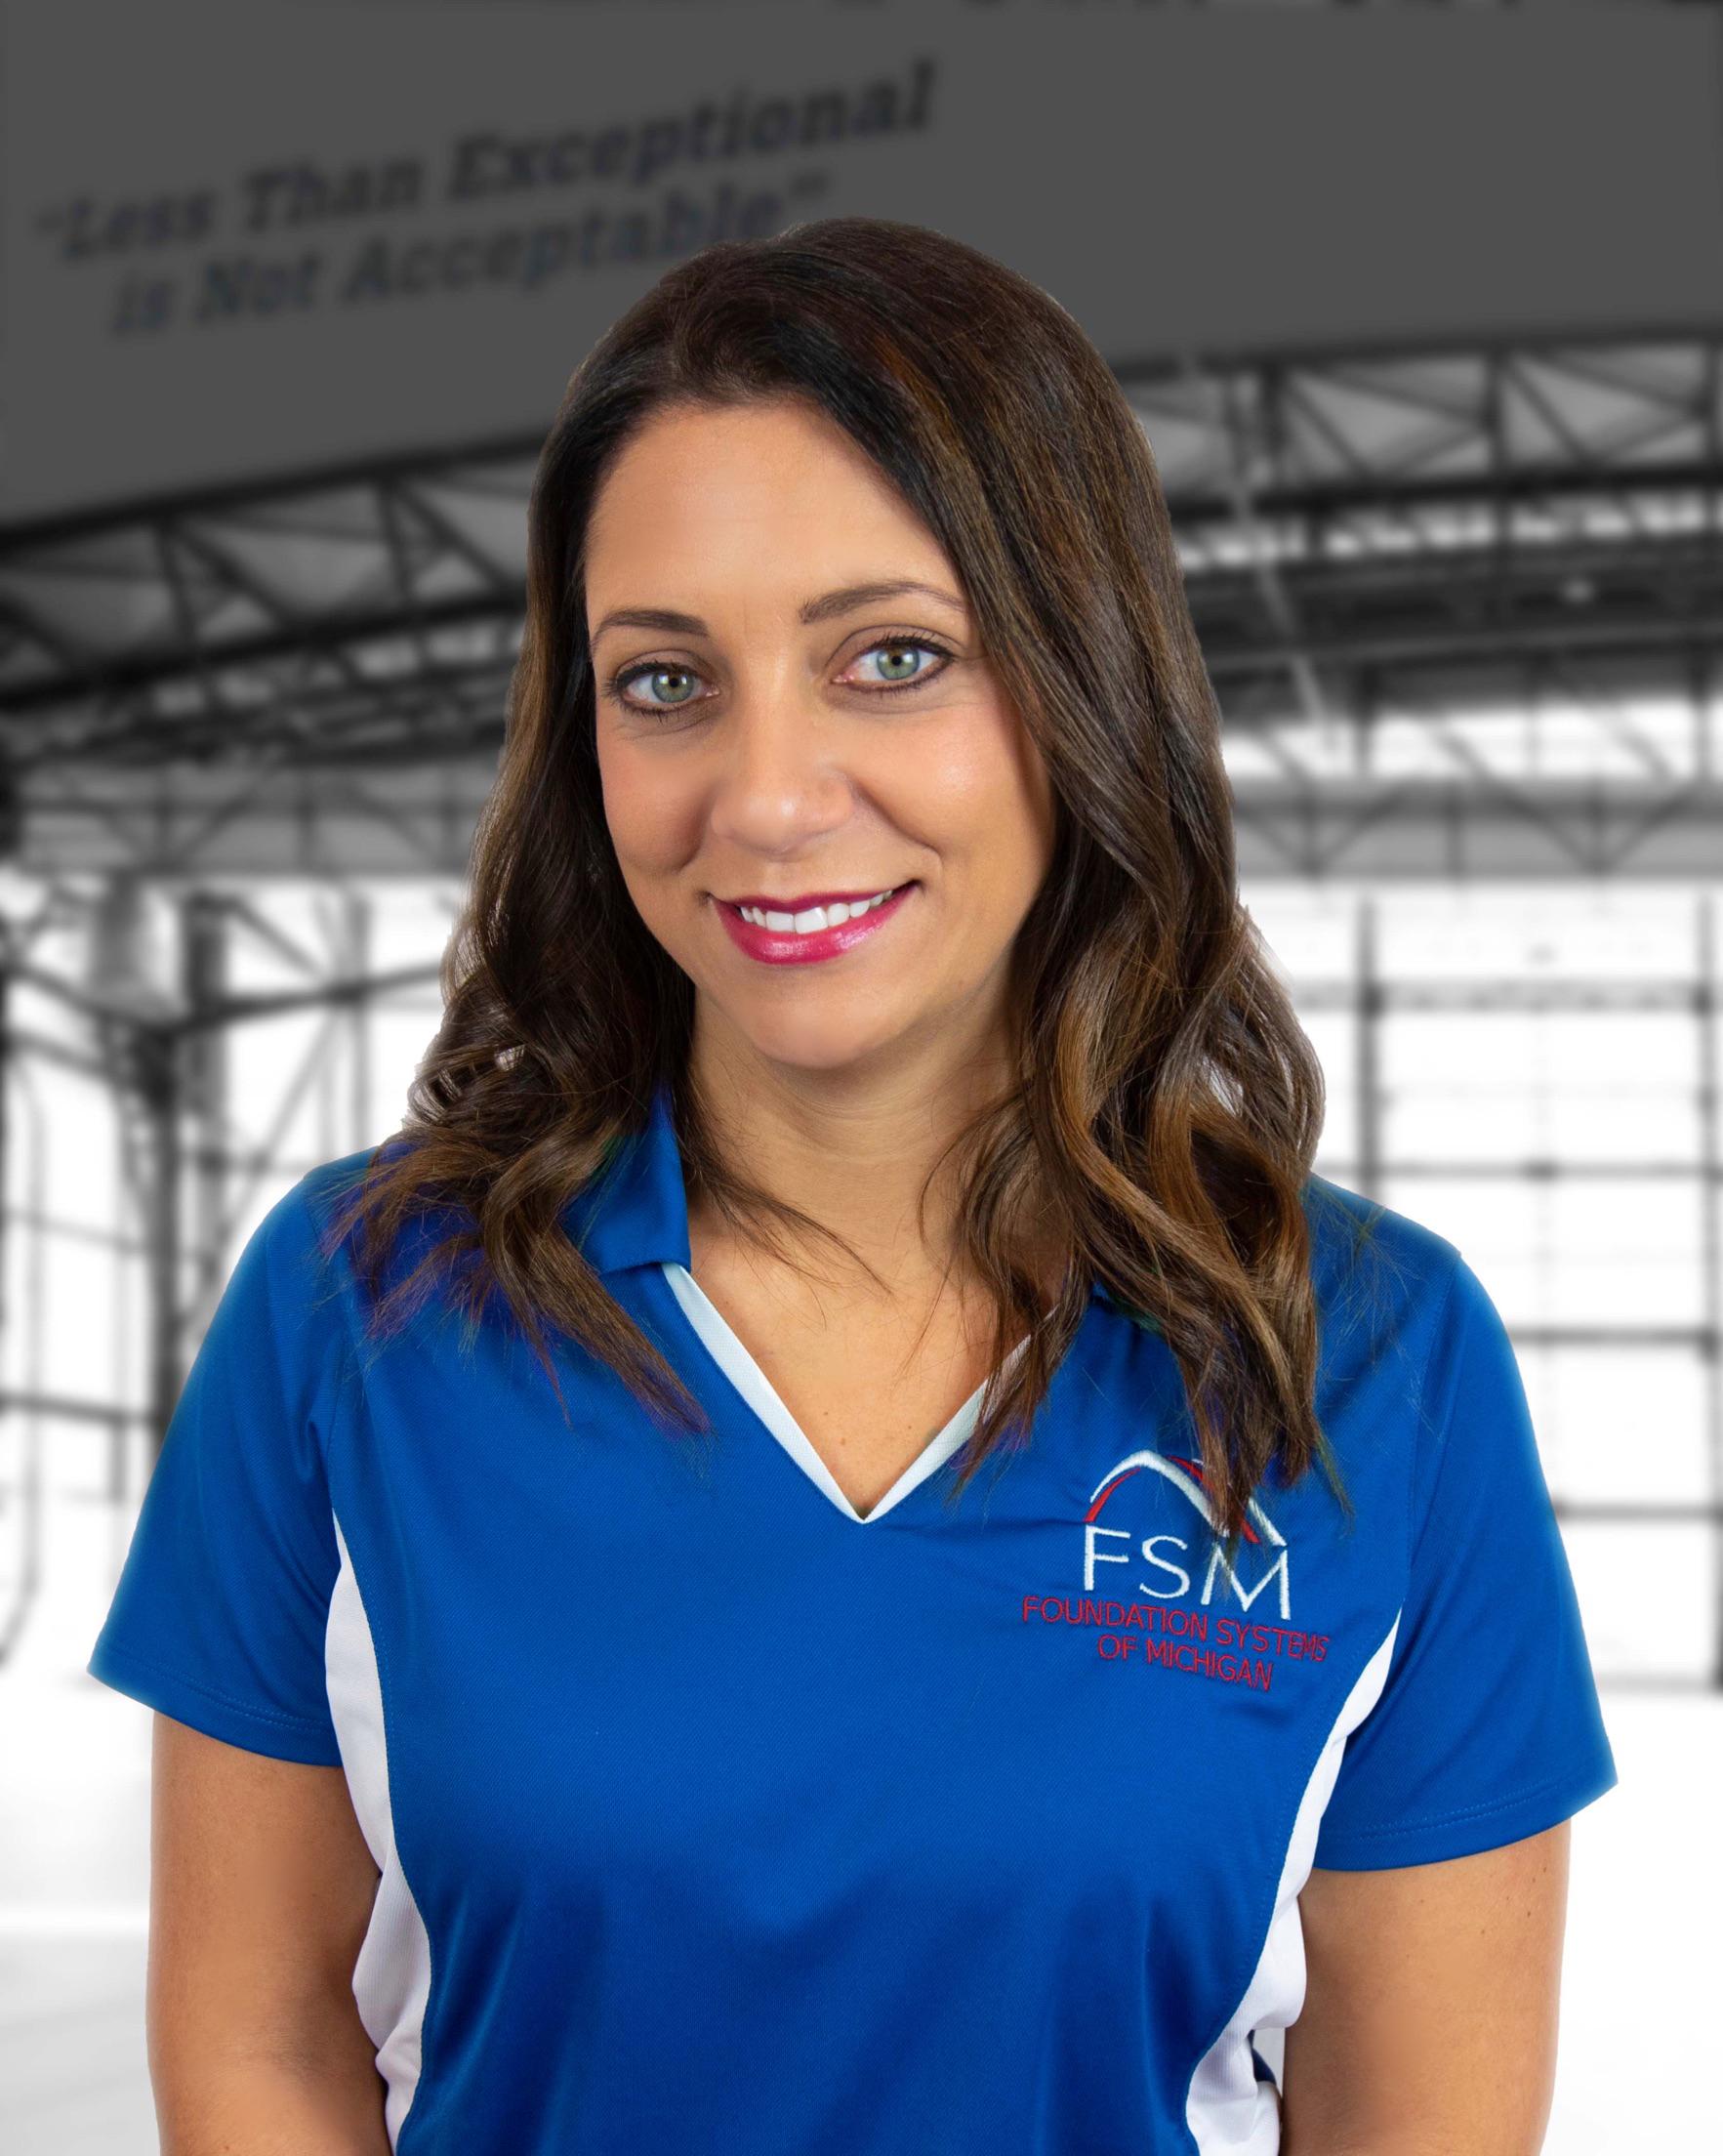 FSM Jennifer Mullaney Recruiting Specialist